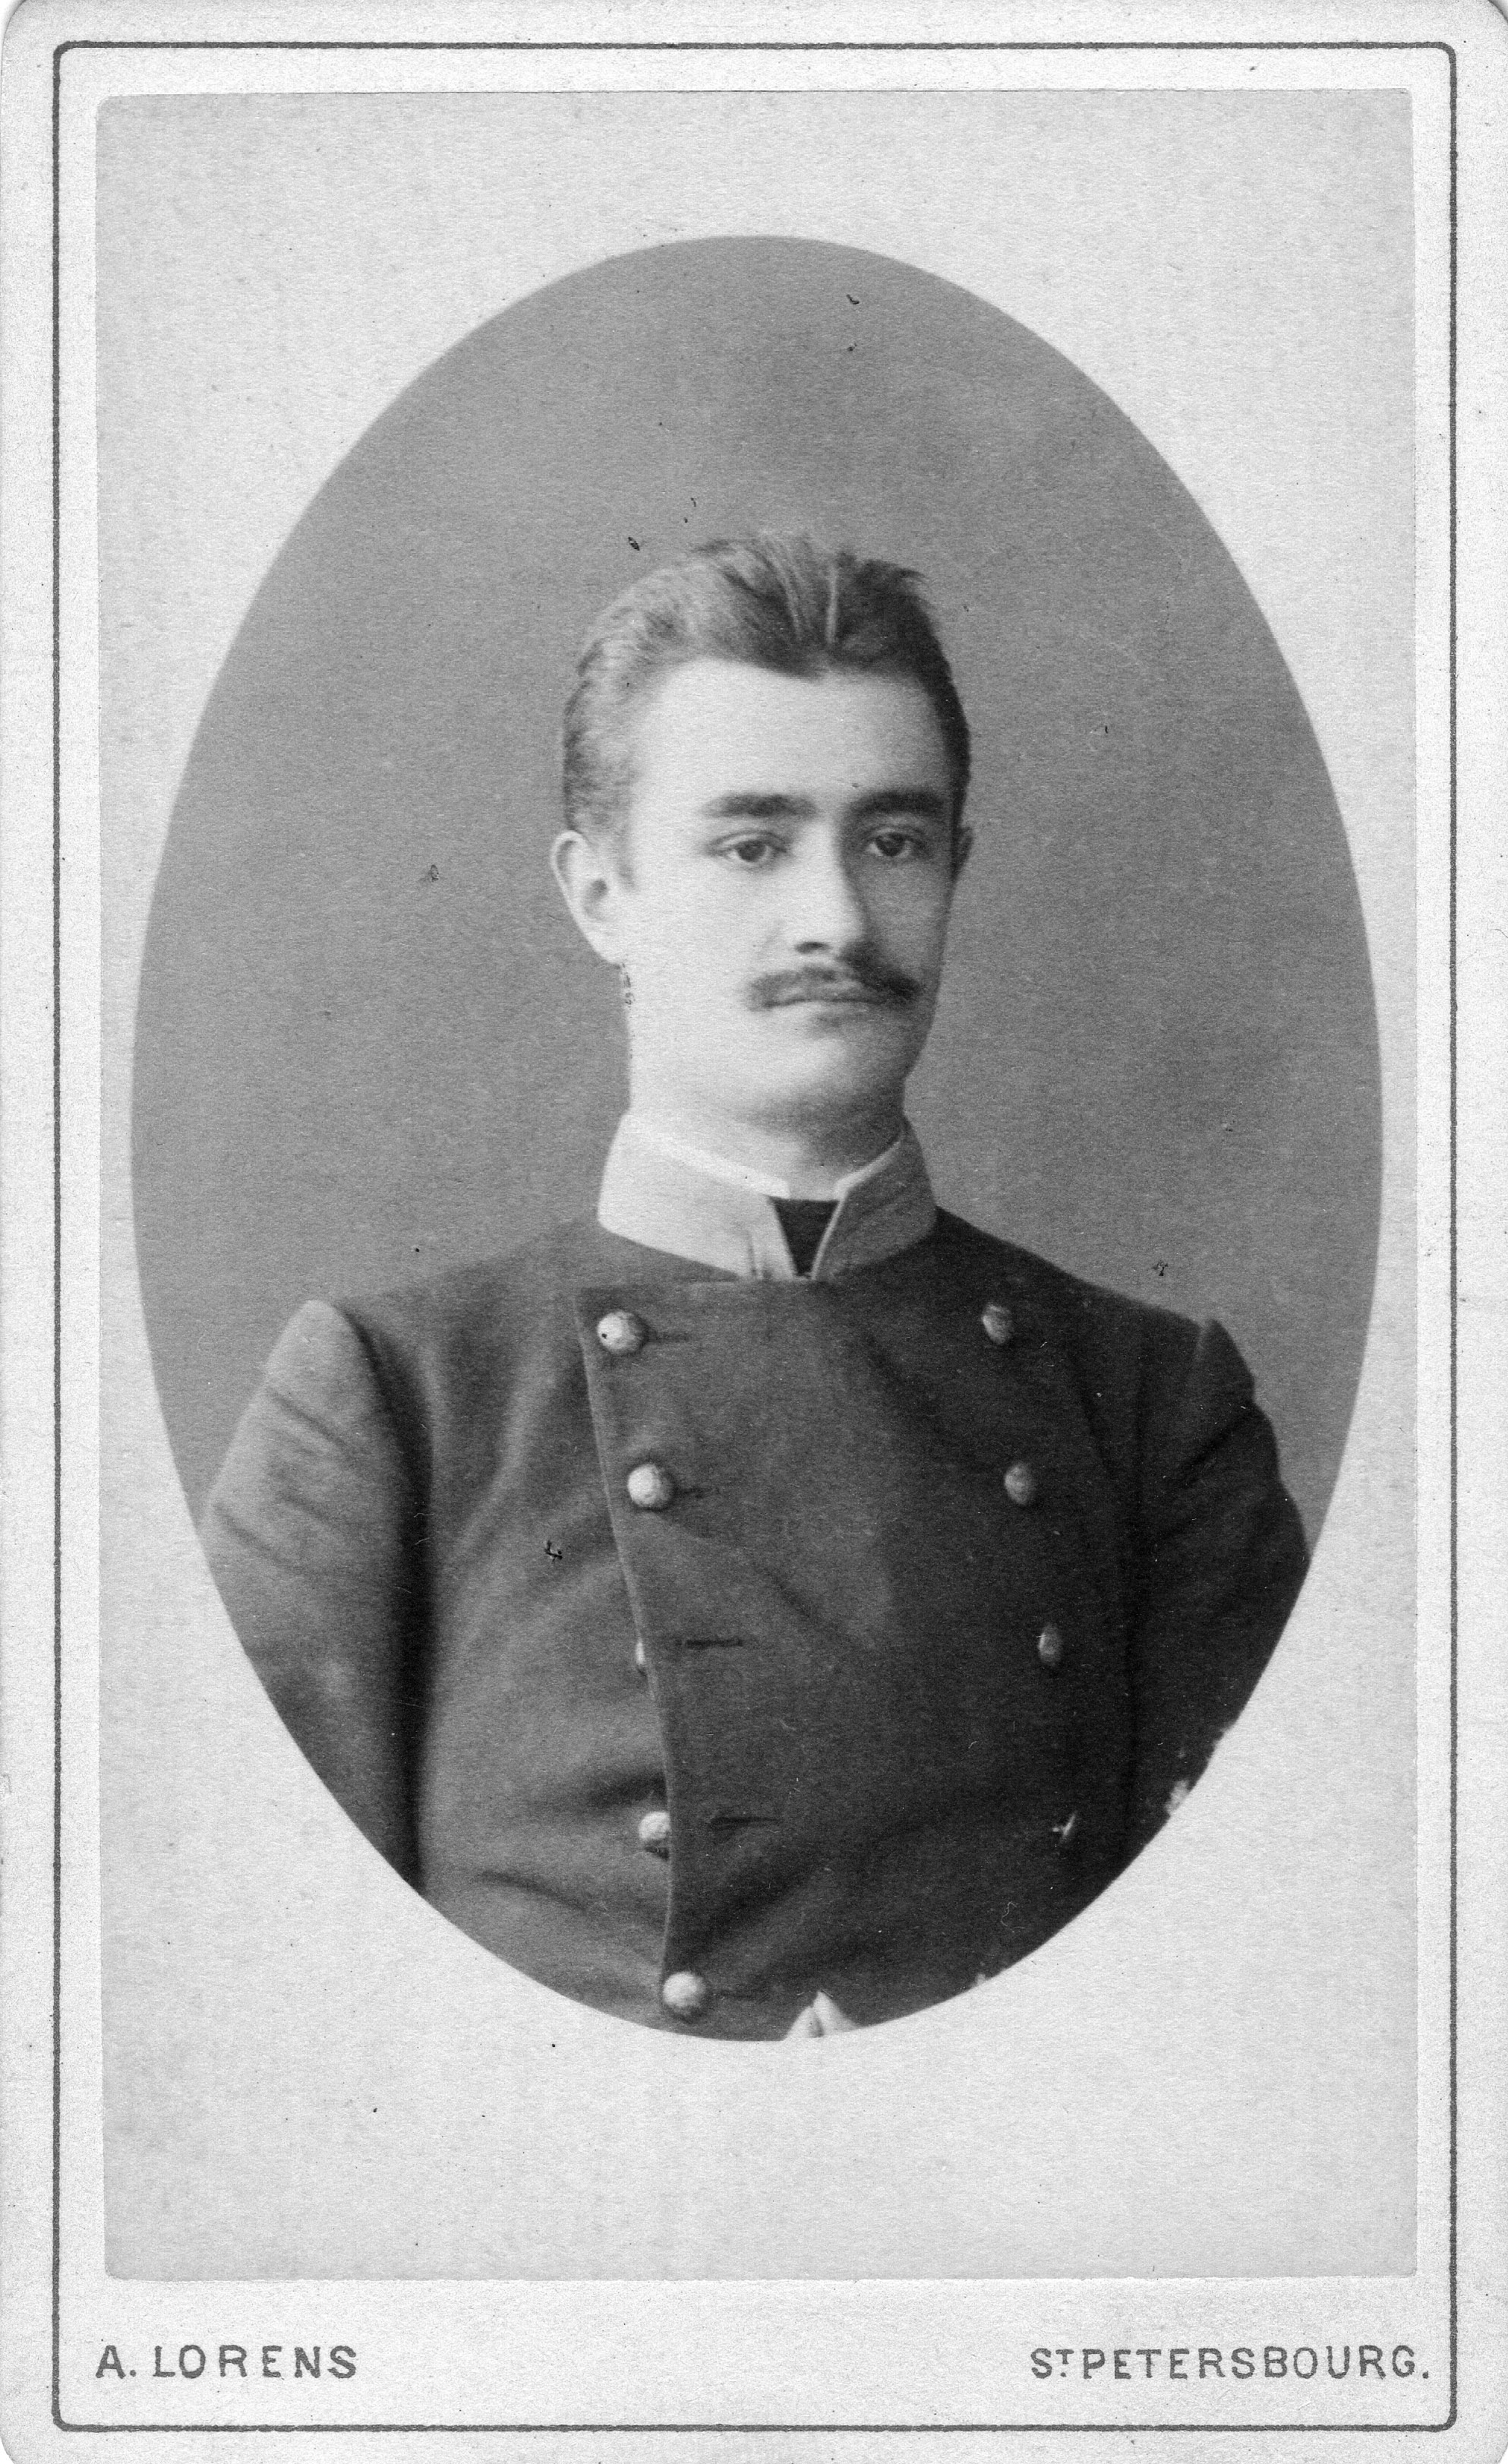 Николай Николаевич Афонасьев (1867-1937).